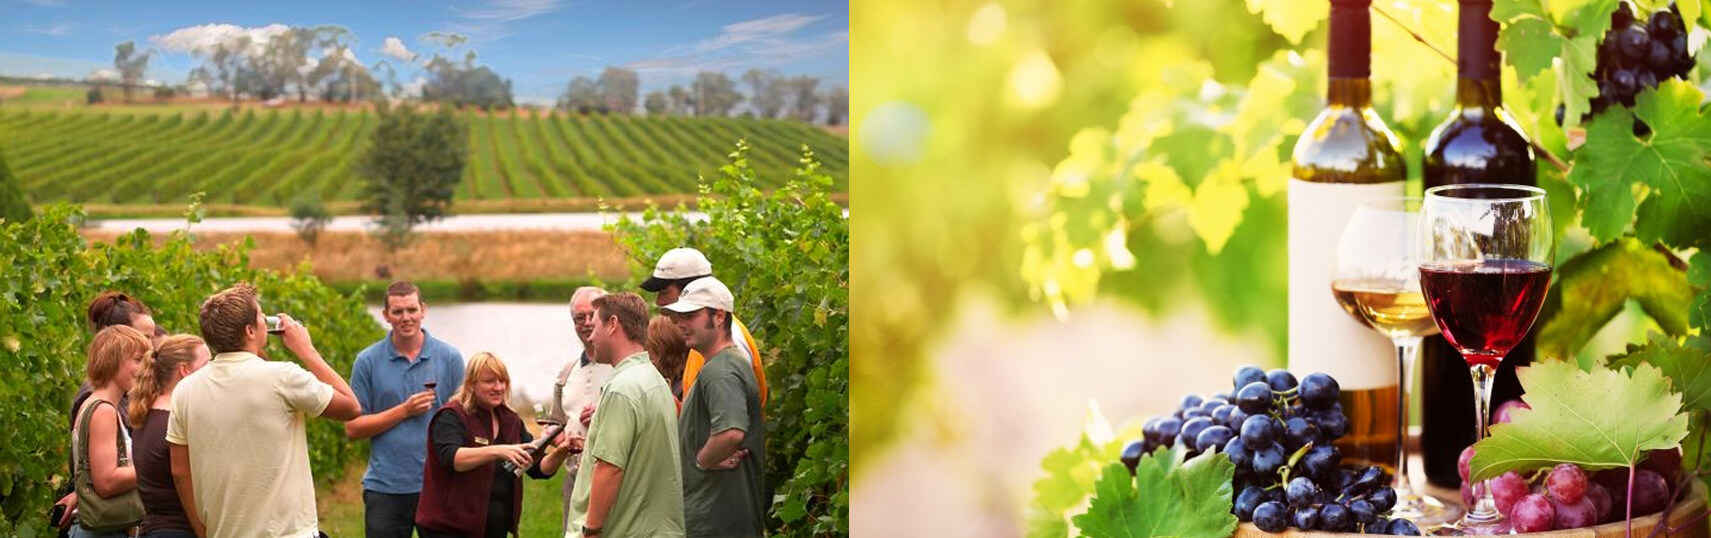 wine-tours-melbourne